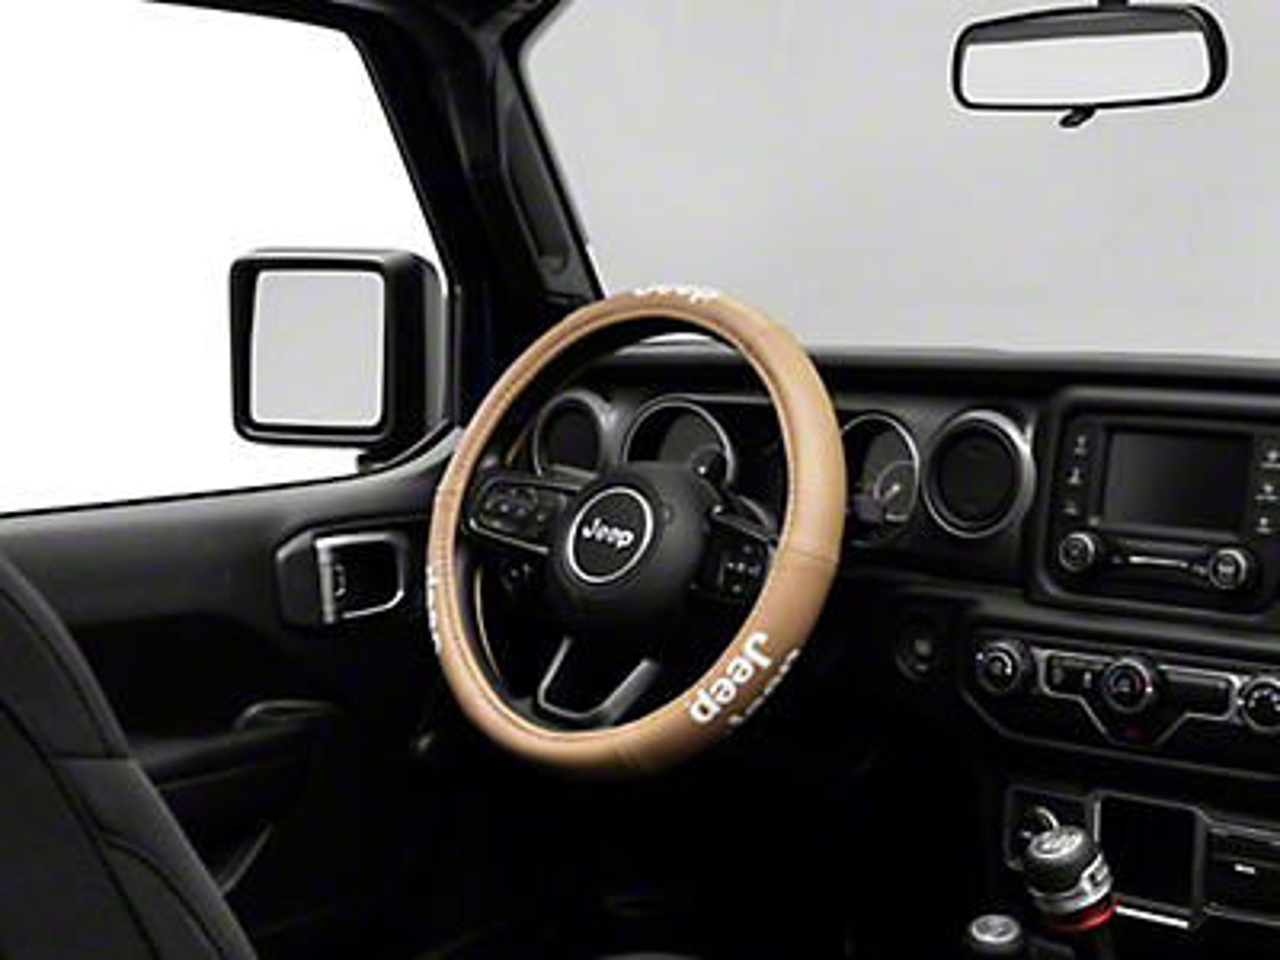 Alterum Jeep Logo Elite Series Speed Grip Steering Wheel Cover - Tan (87-18 Jeep Wrangler YJ, TJ, JK & JL)